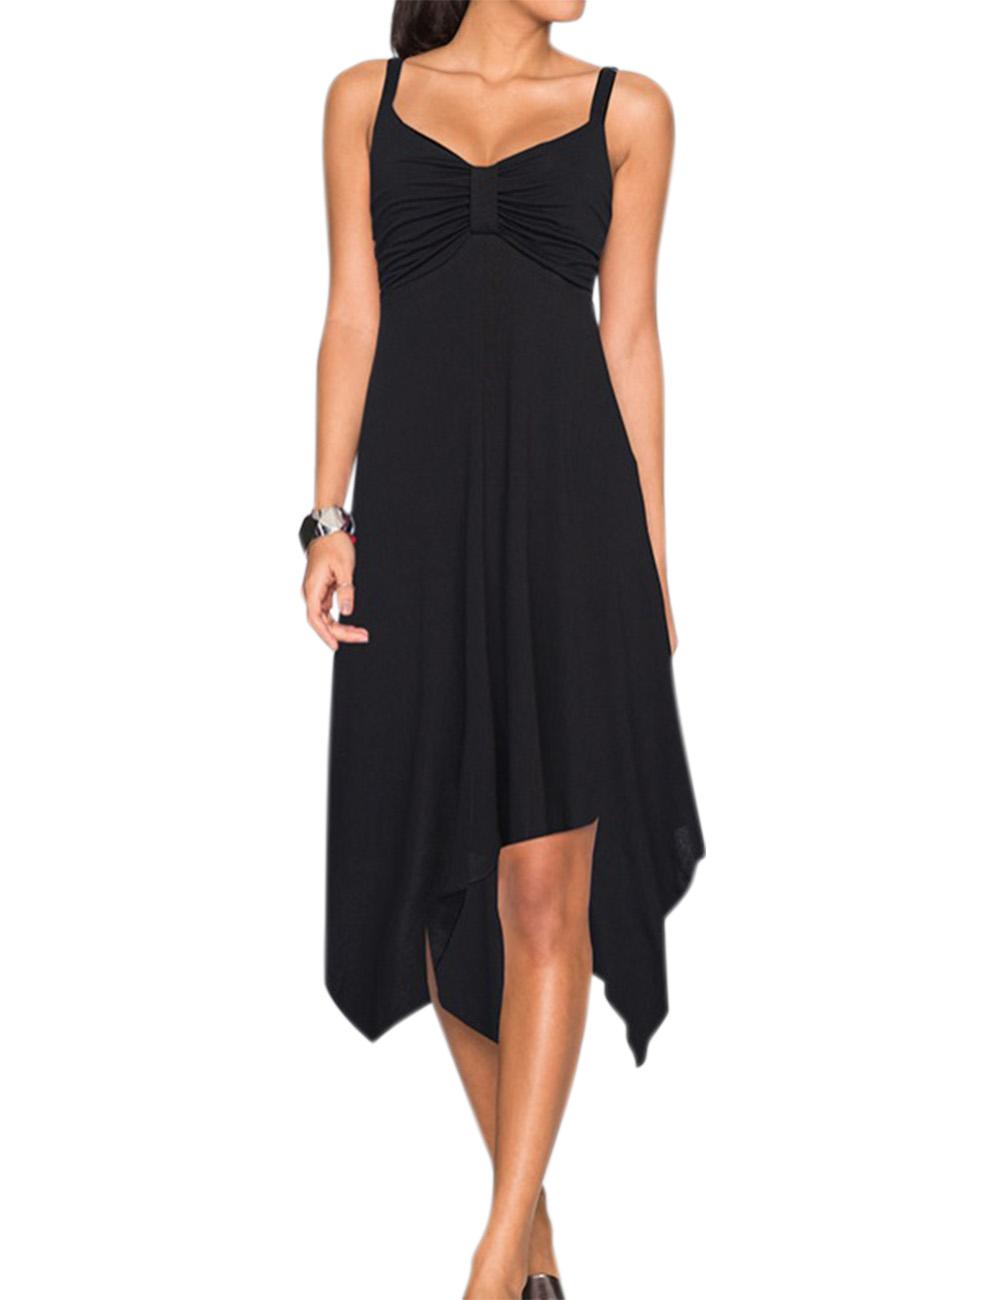 Liebeye Women's Casual Spaghetti Strap Ruched Asymmetrical A-line Sun Dress Black_L